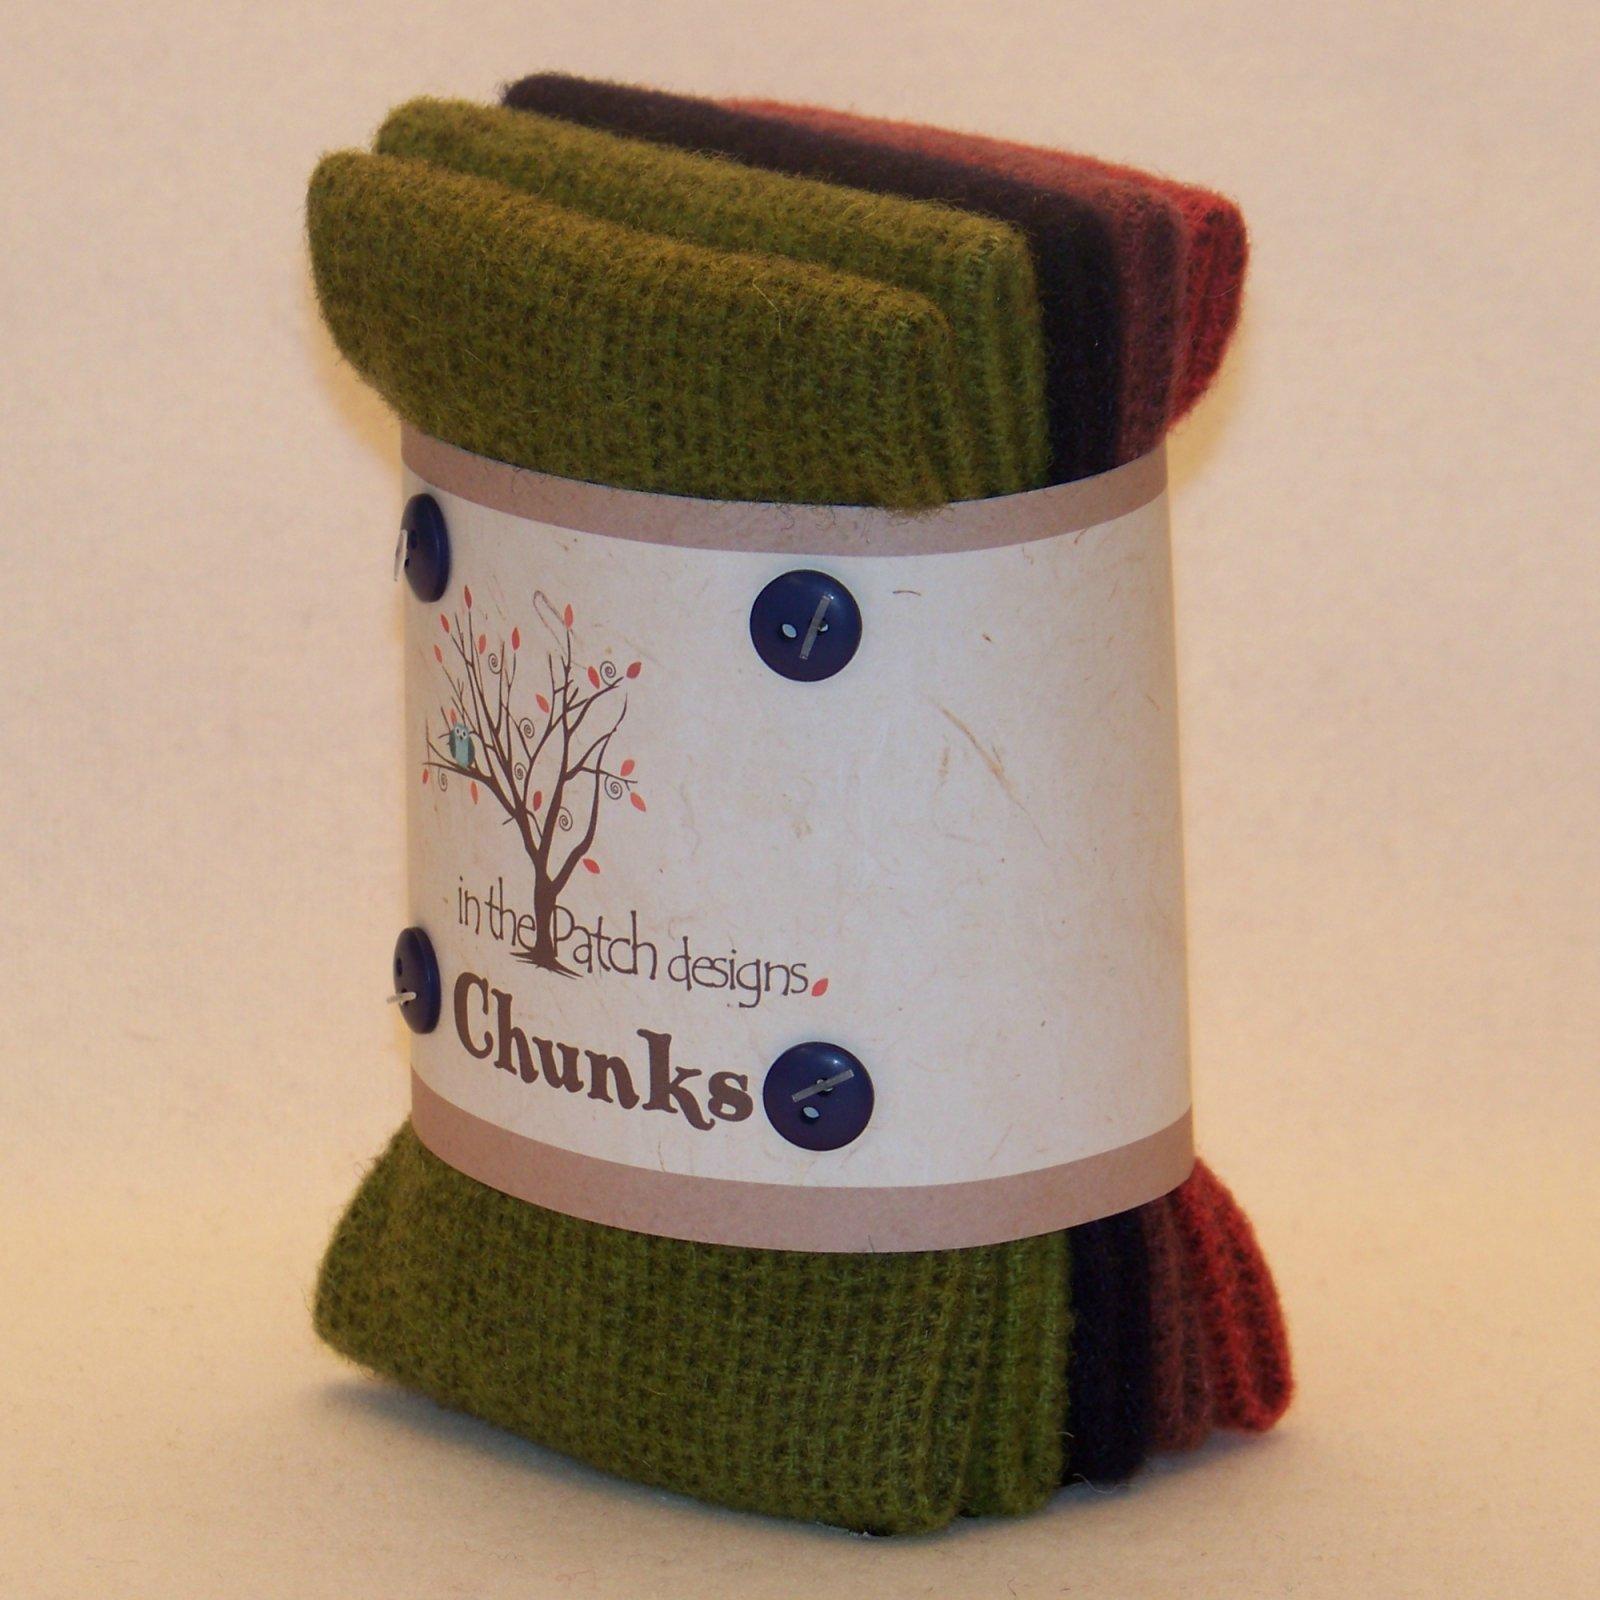 Chunks - Christmas - 9 x 10 5 pcs